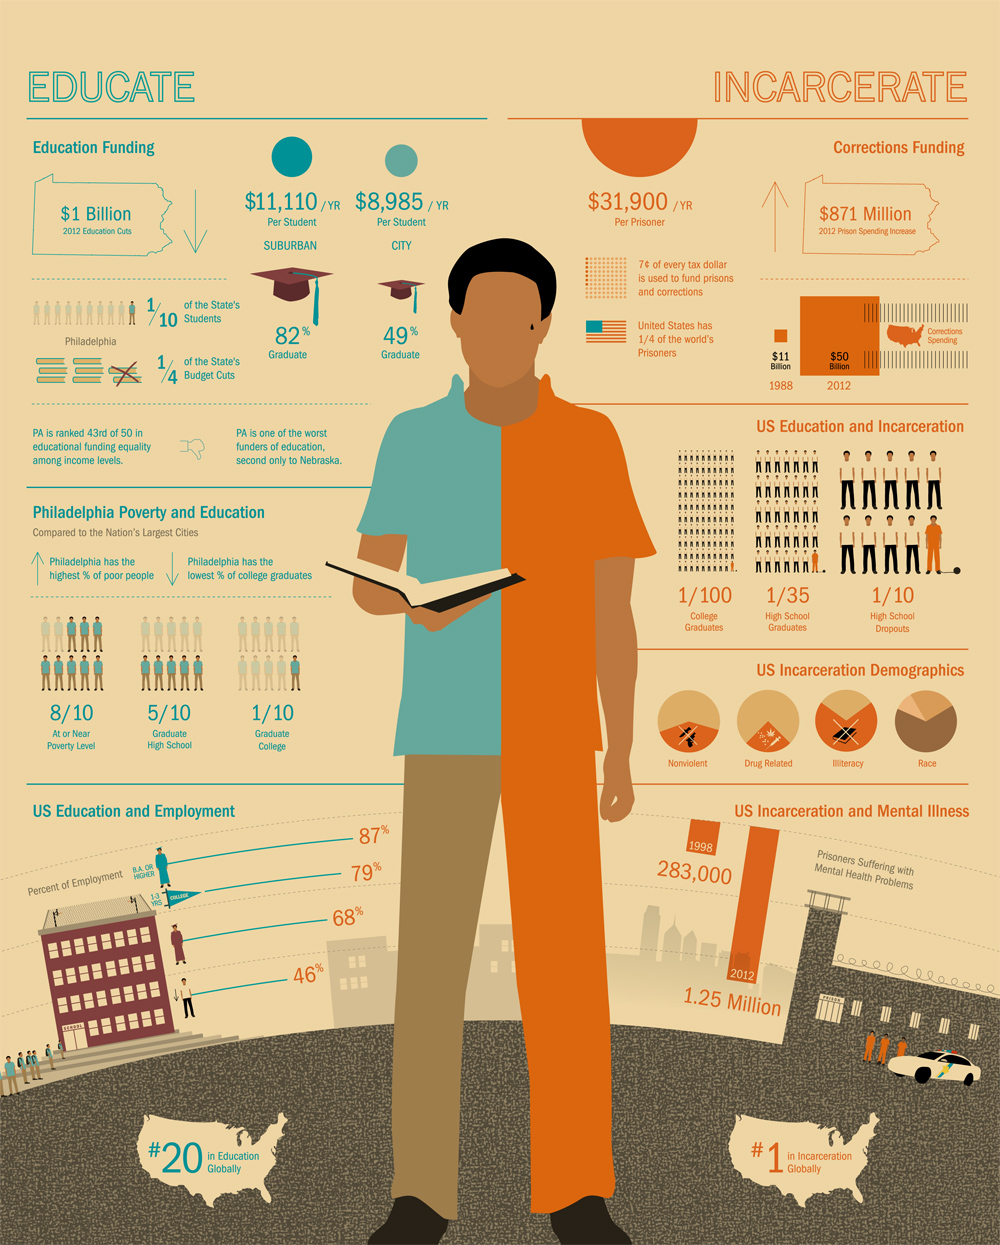 Education-Vs-Incarceration-infographic